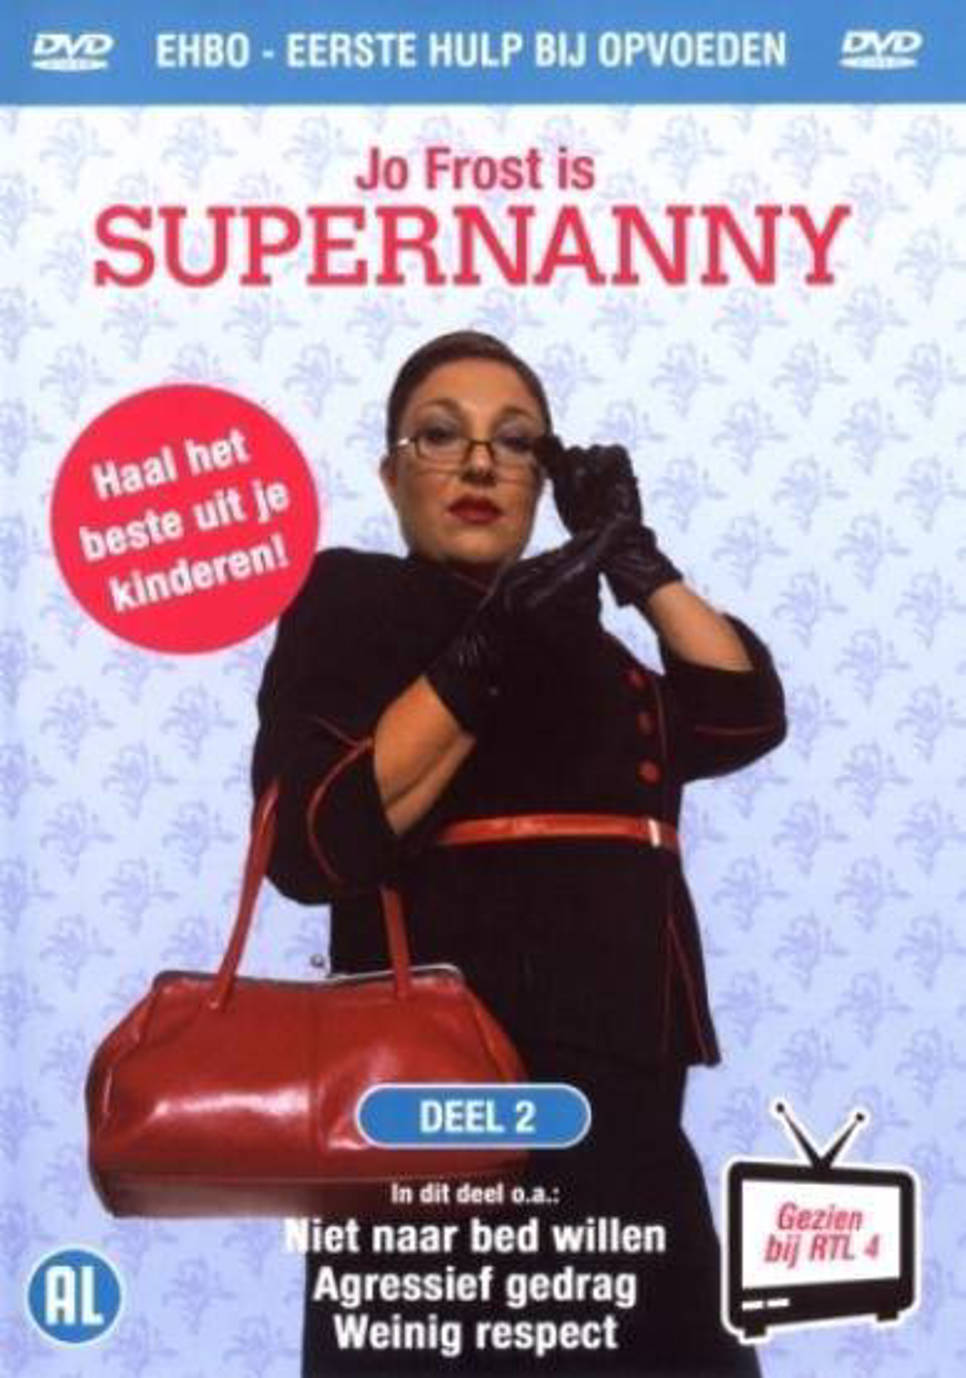 Supernanny Jo Frost - EHBO bij opvoeden 2 (DVD)